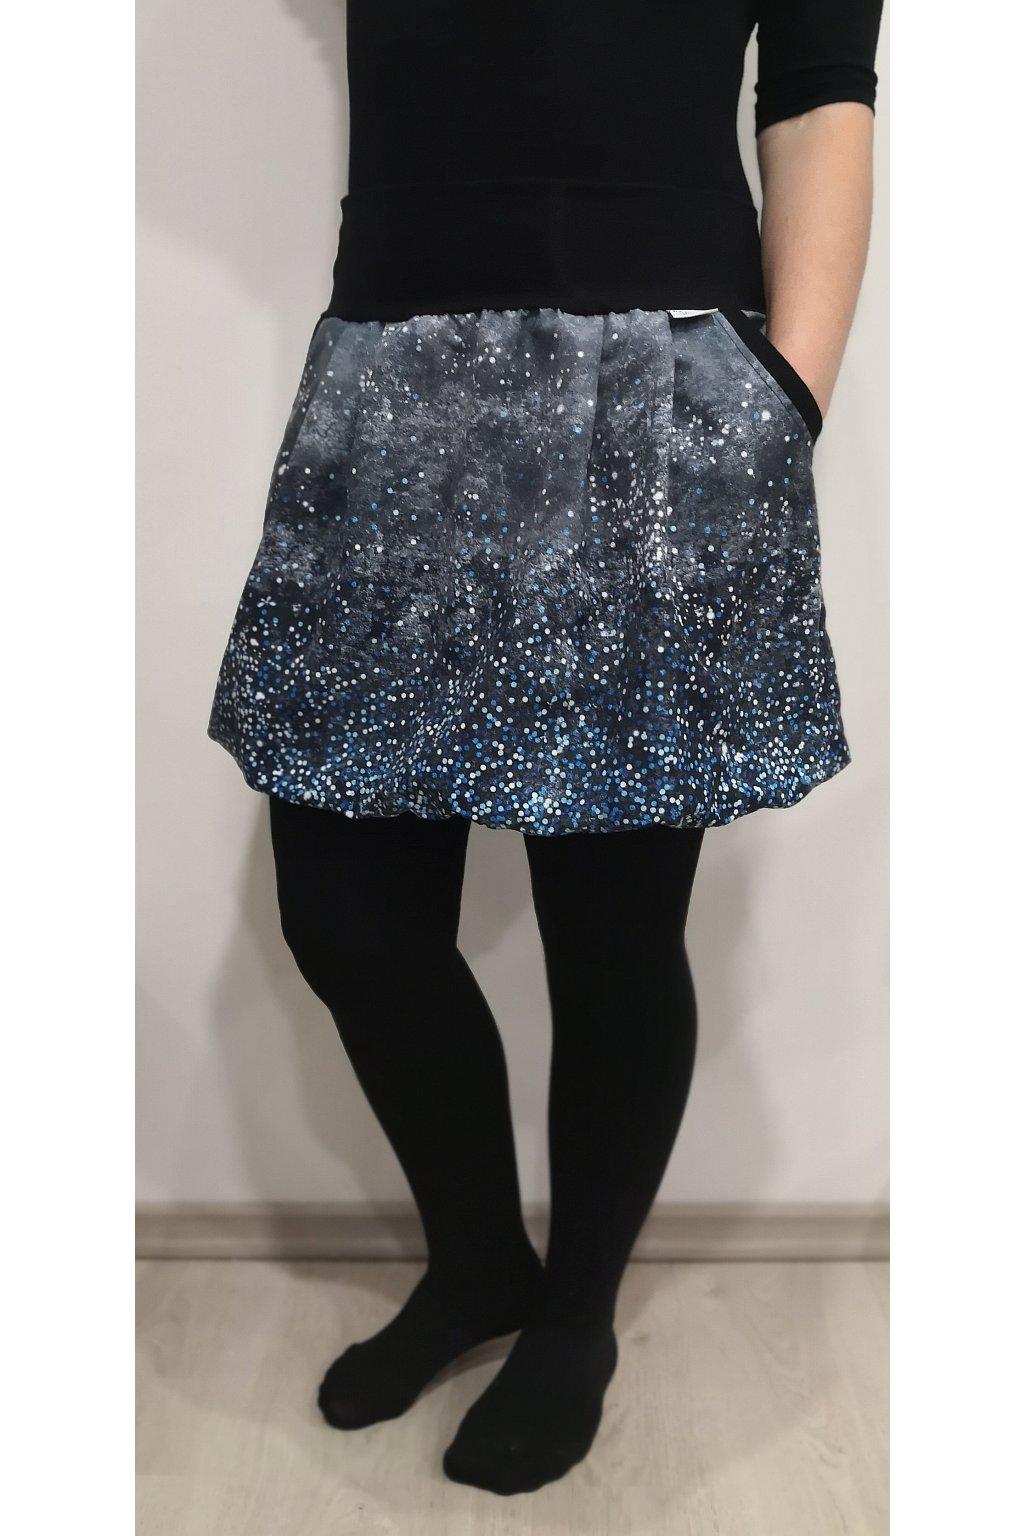 balonova sukne puntiky modre papilio clothing (2)